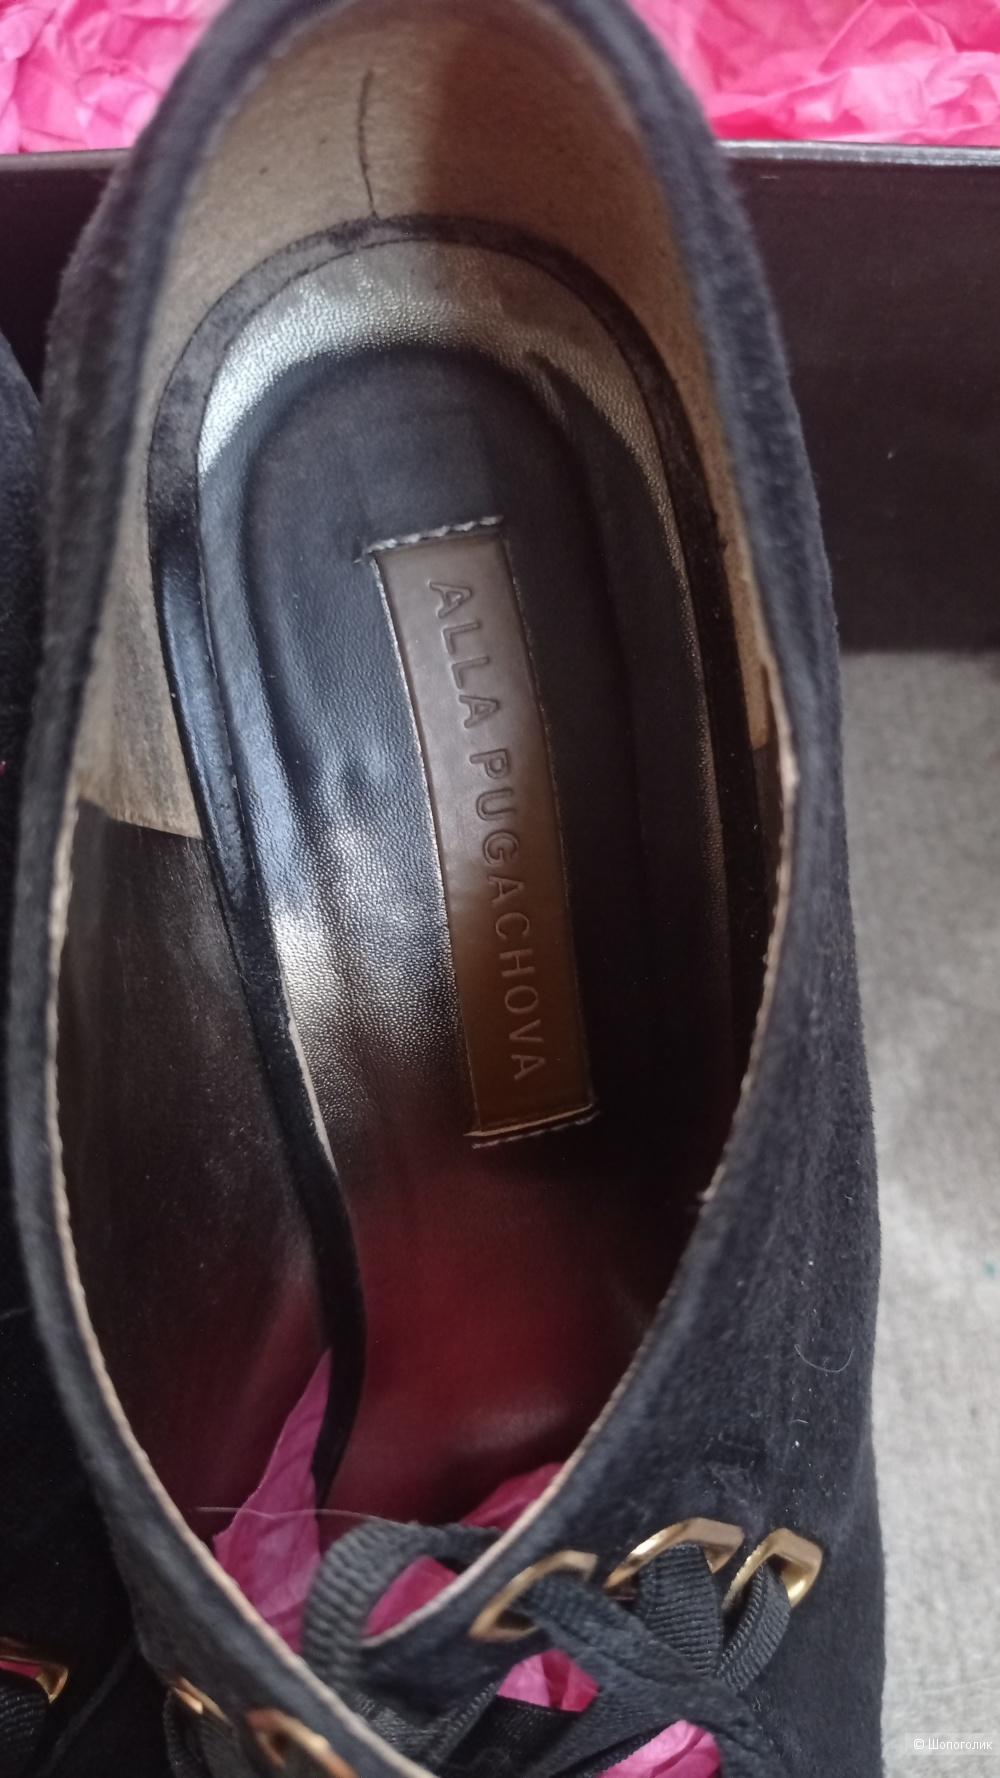 Alla Pugachova туфли/ботильоны 38 размер